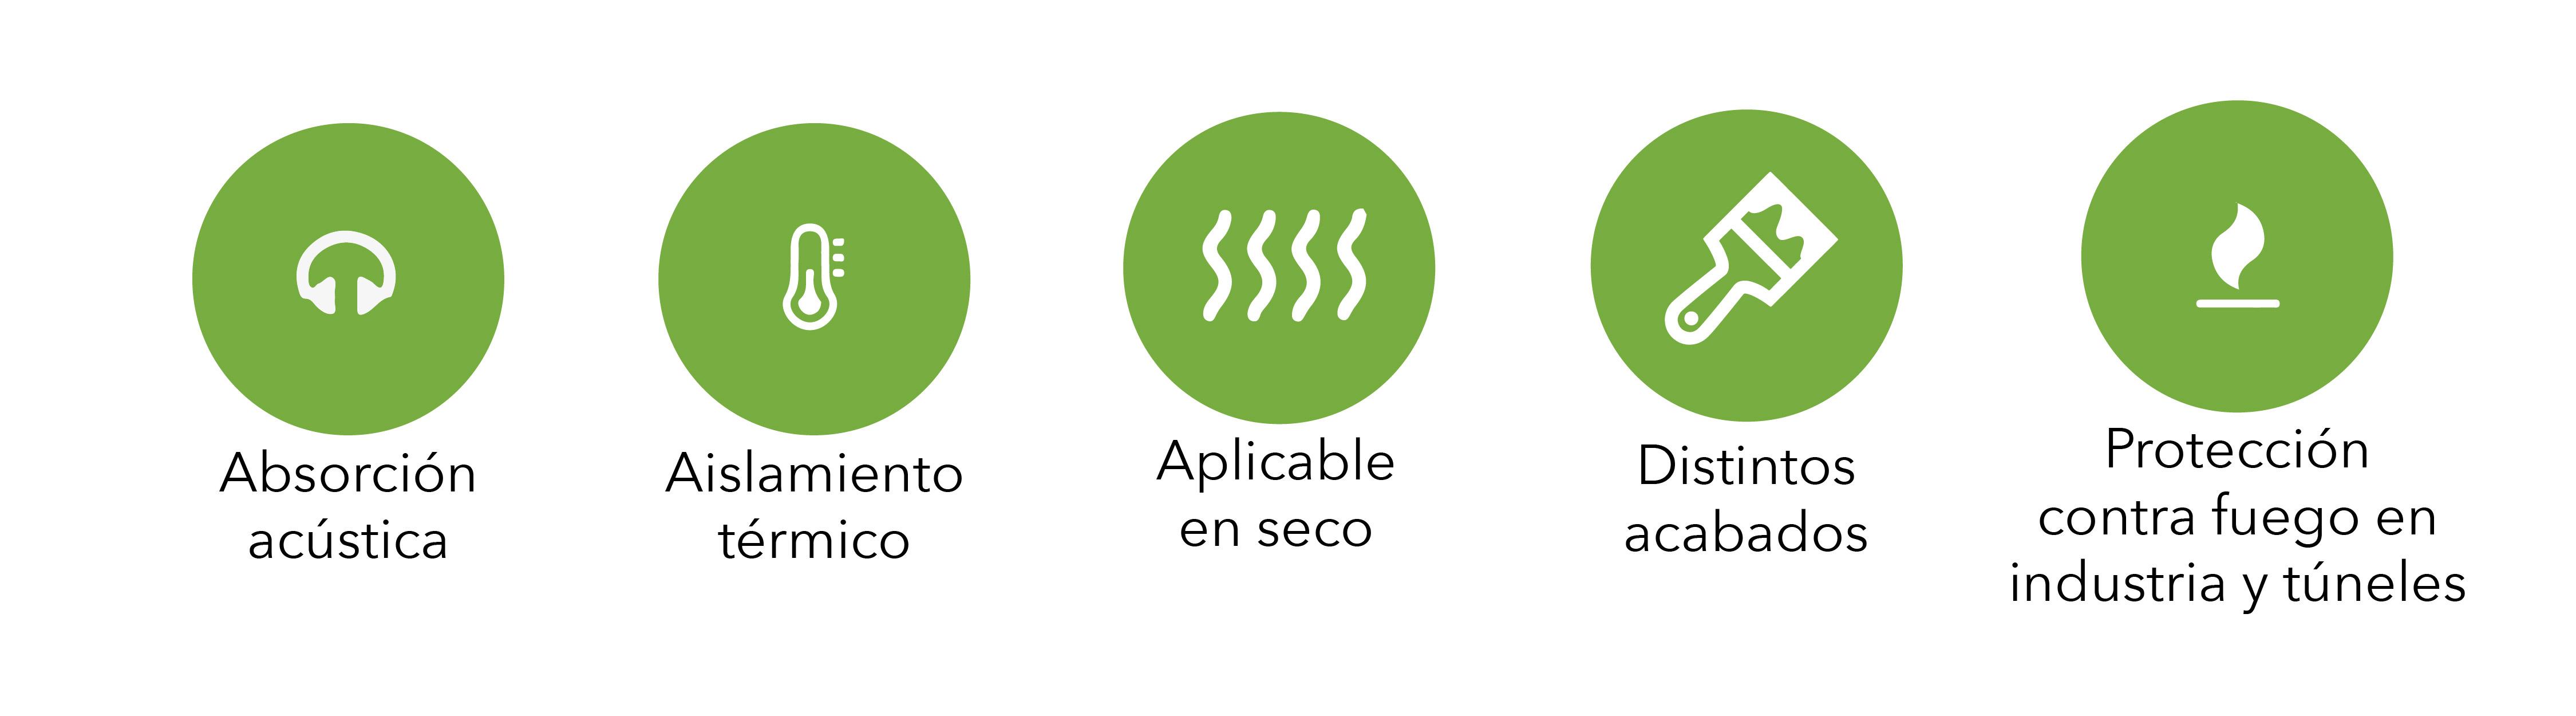 iconos ventajas panel proteccion tuneles synixtor